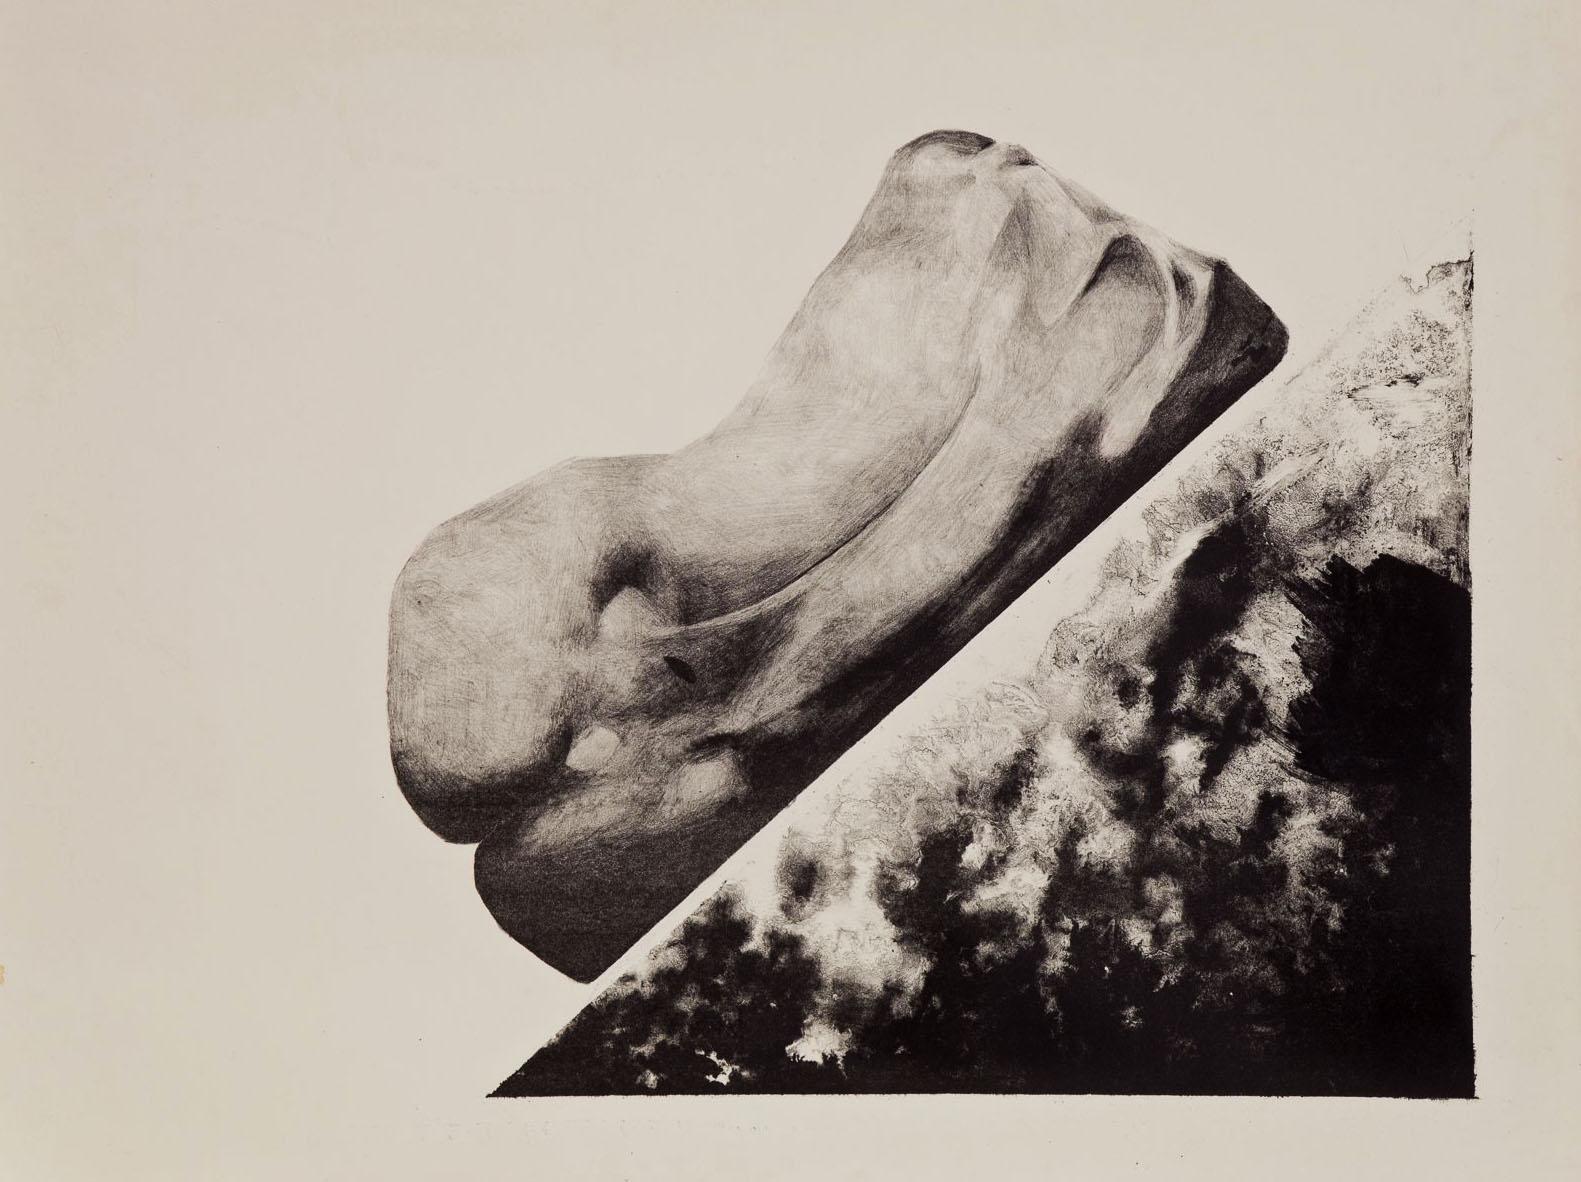 litho_body boulder.jpg